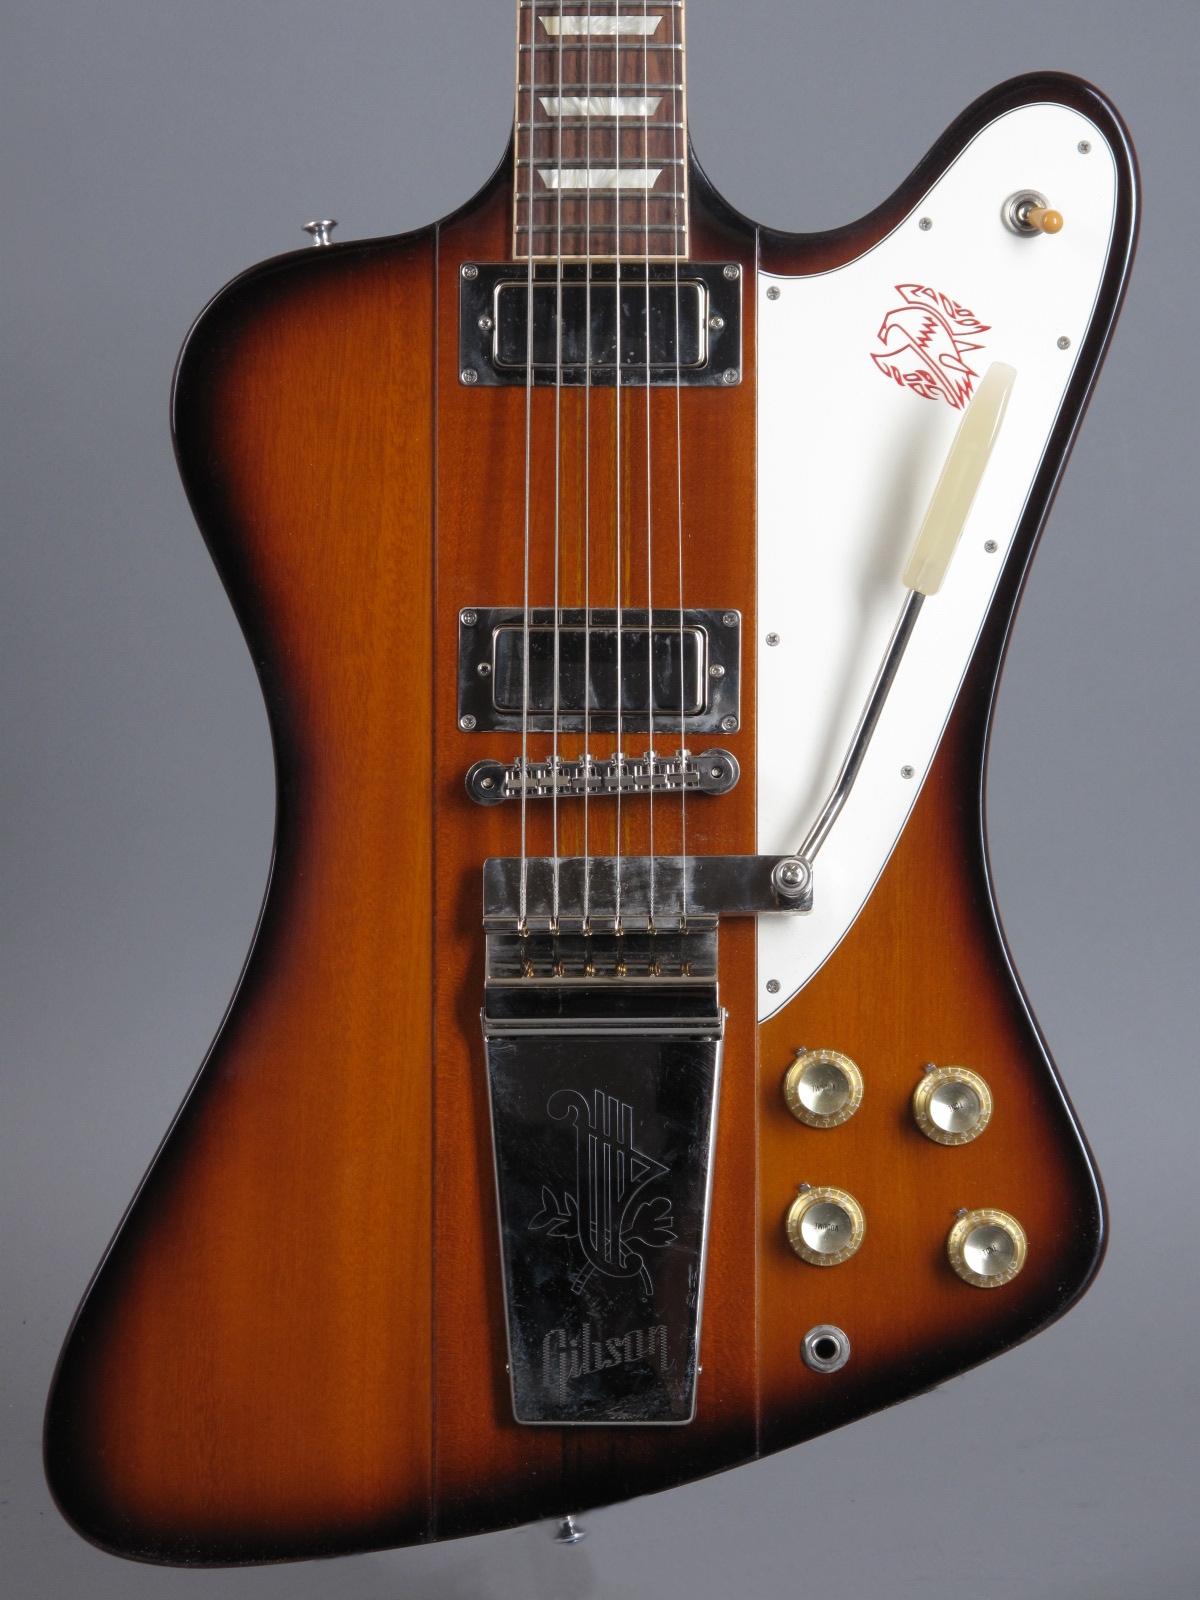 2010 Gibson Firebird V - Sunburst